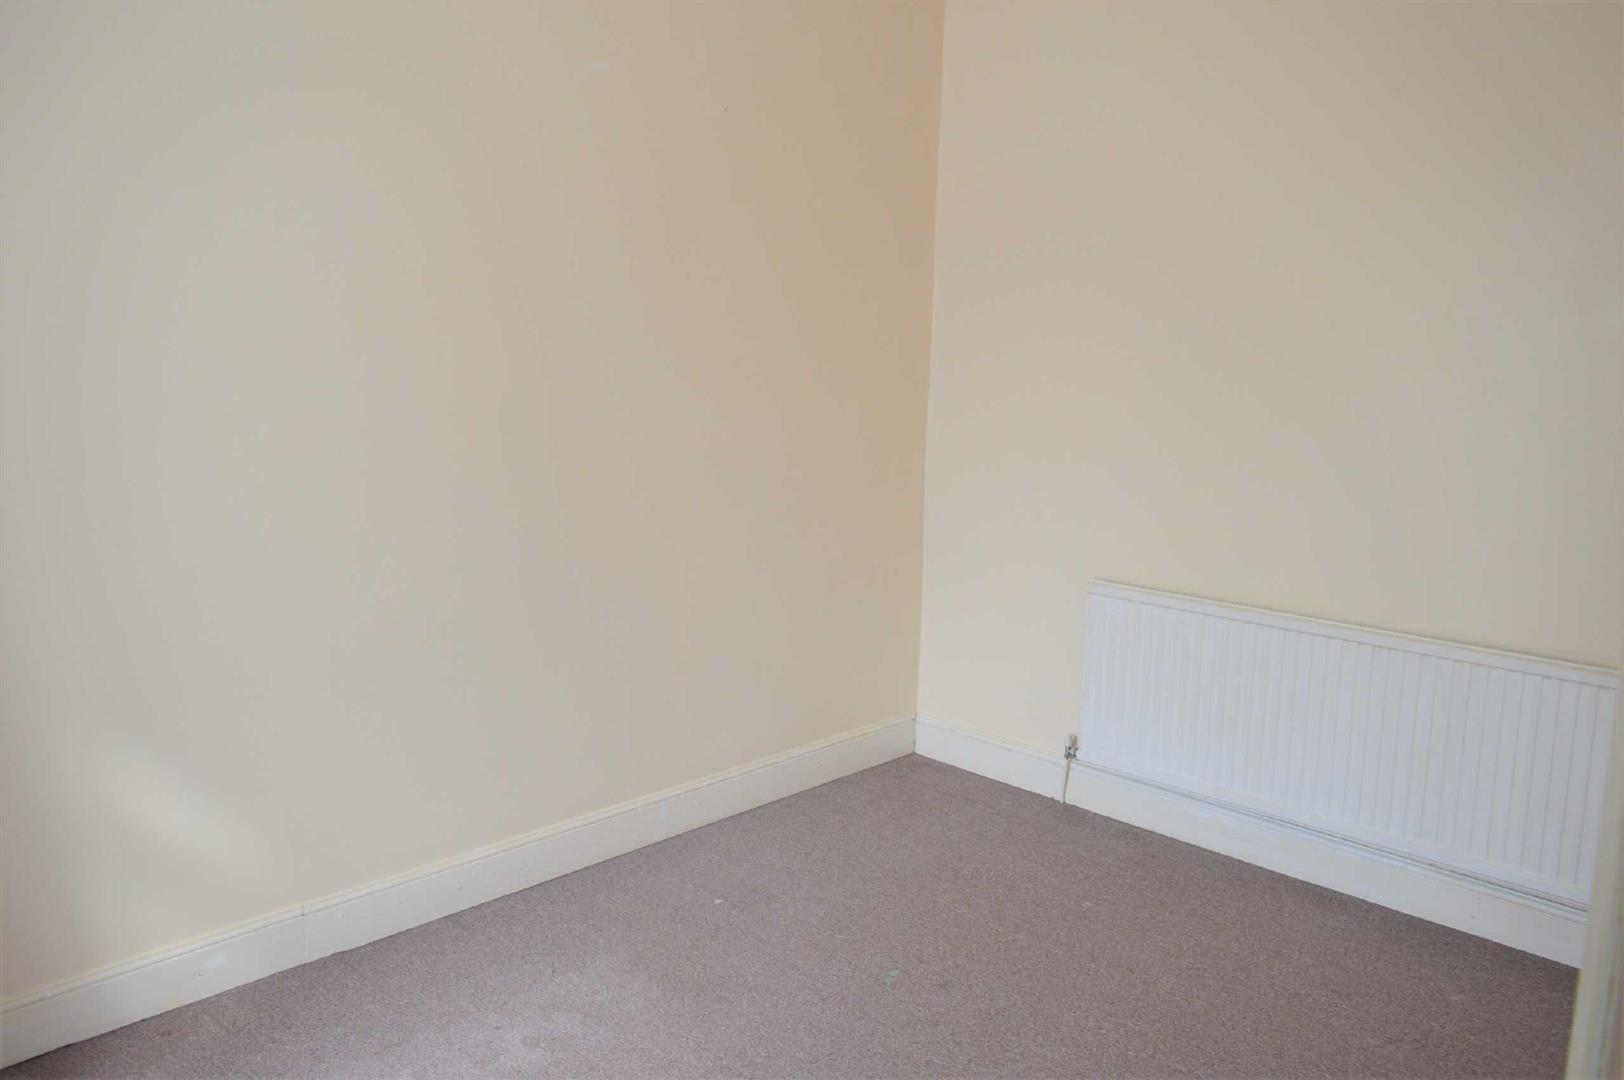 Iorwerth Street, Manselton, Swansea, SA5 9NP